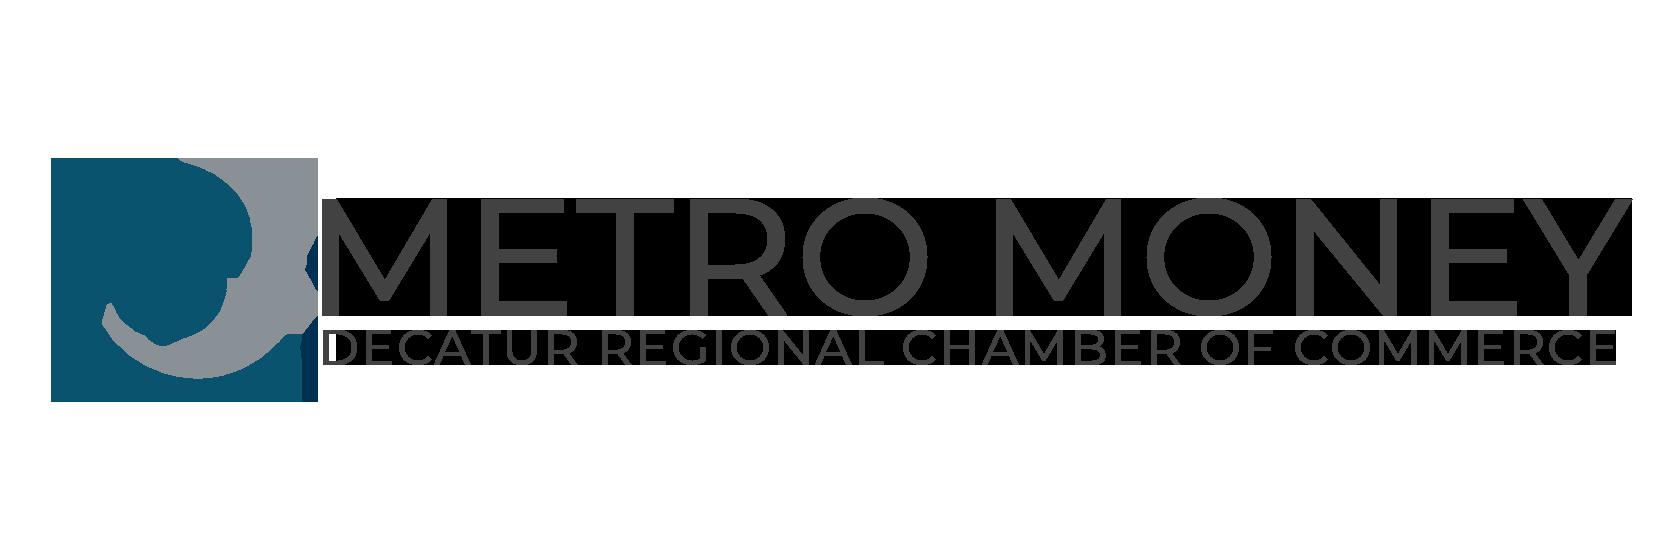 DRCC-MetroMoney